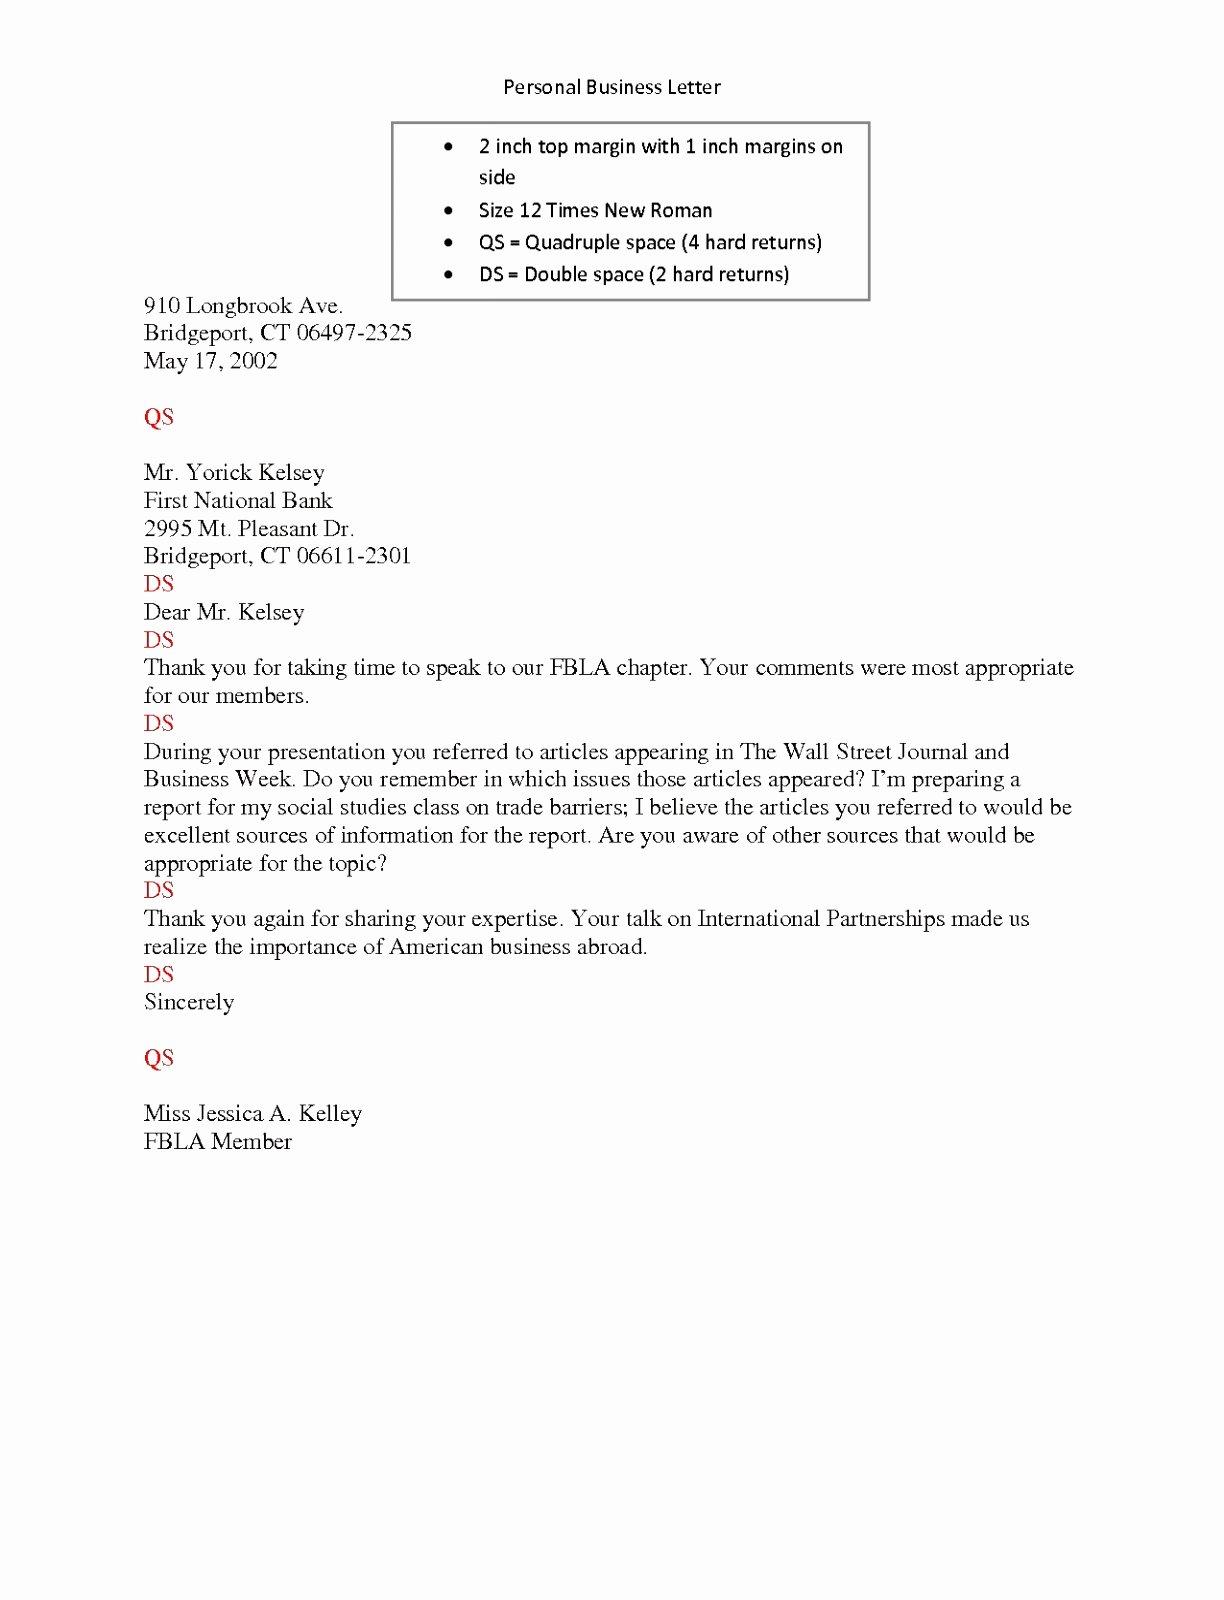 Letter format Google Docs Inspirational 6 Google Docs Business Letter Template Ieate